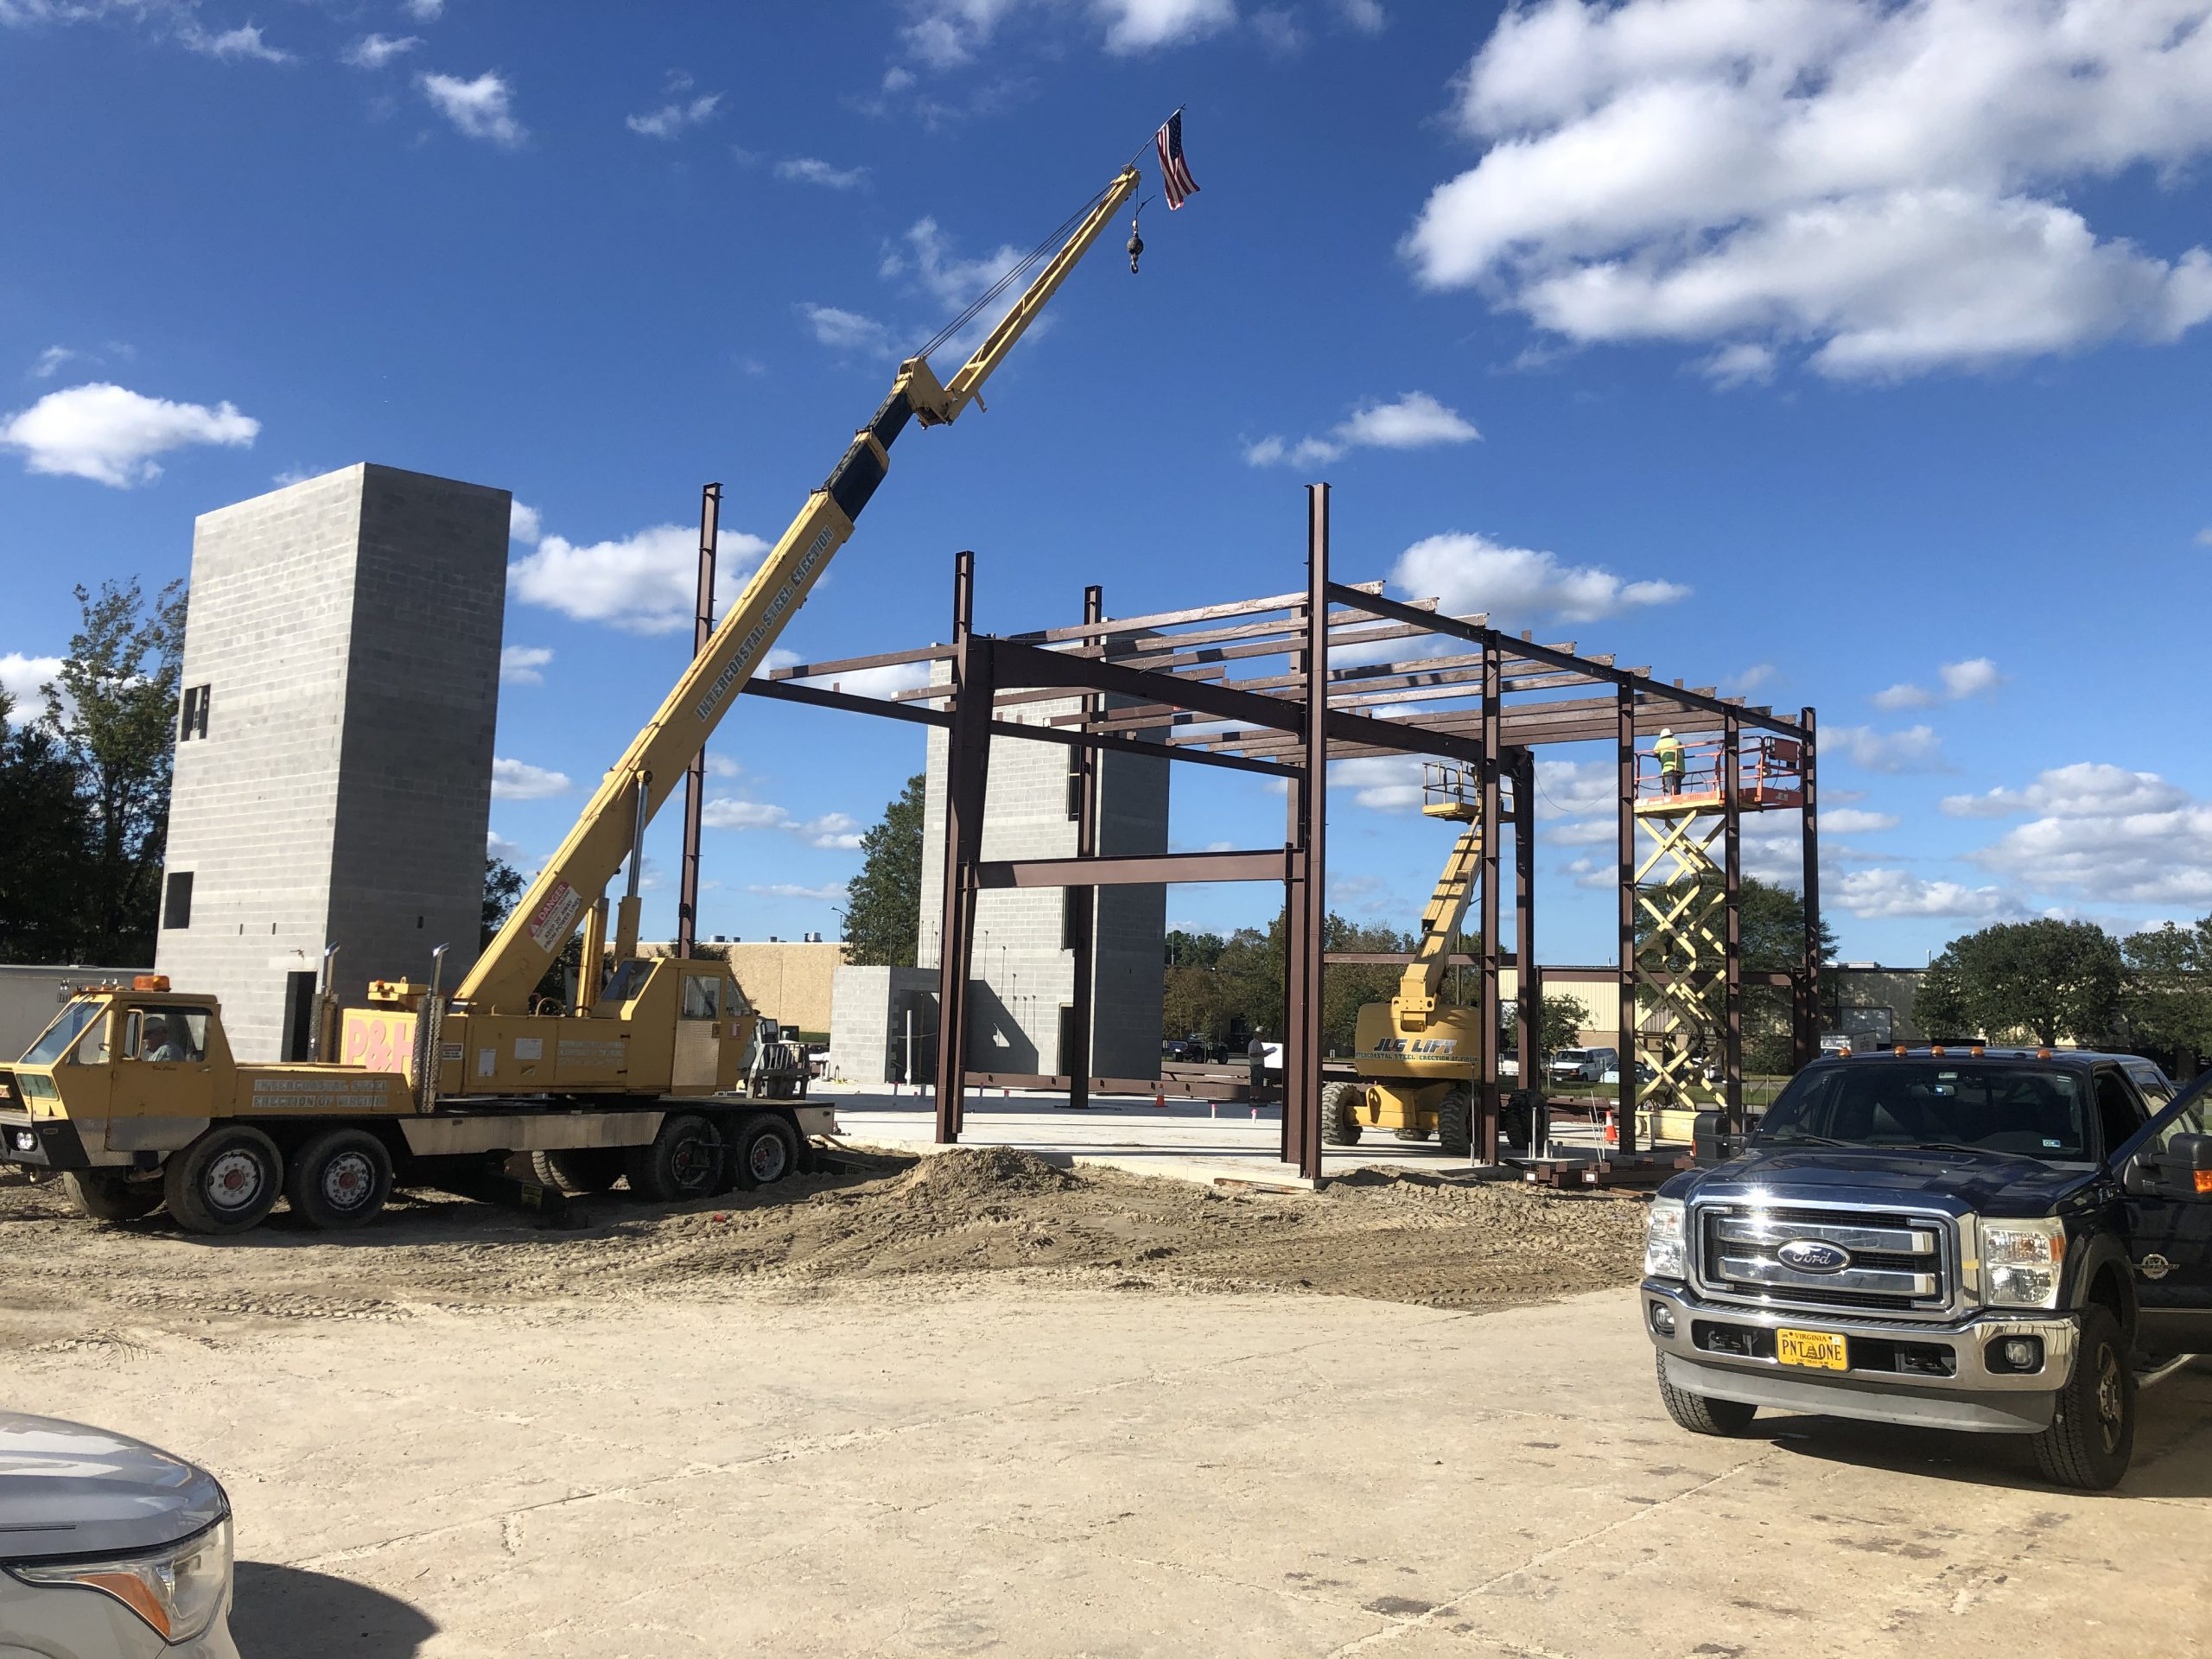 Steel frames going up